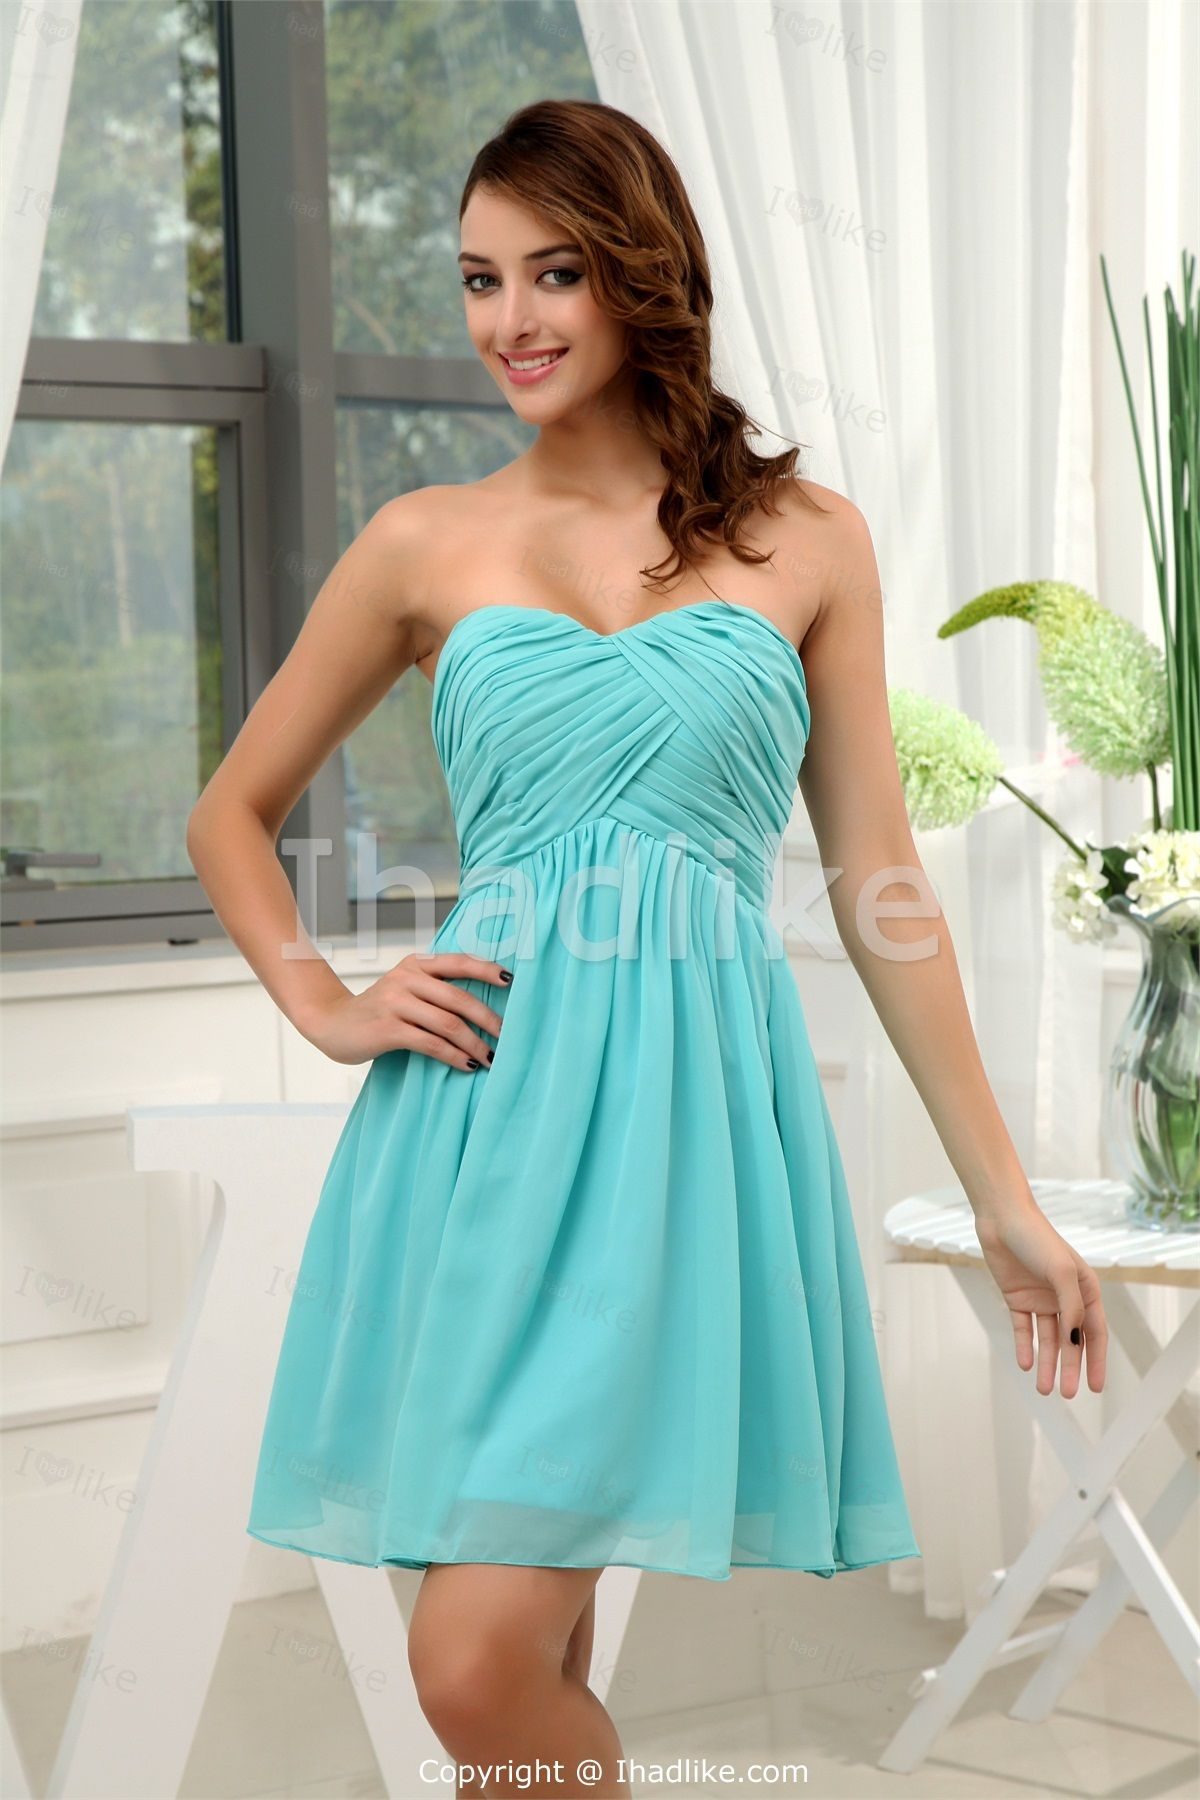 Turquoise bridesmaid dresses turquoise criss cross mini turquoise bridesmaid dresses turquoise criss cross mini sleeveless bridesmaid dresses bridesmaid ombrellifo Gallery